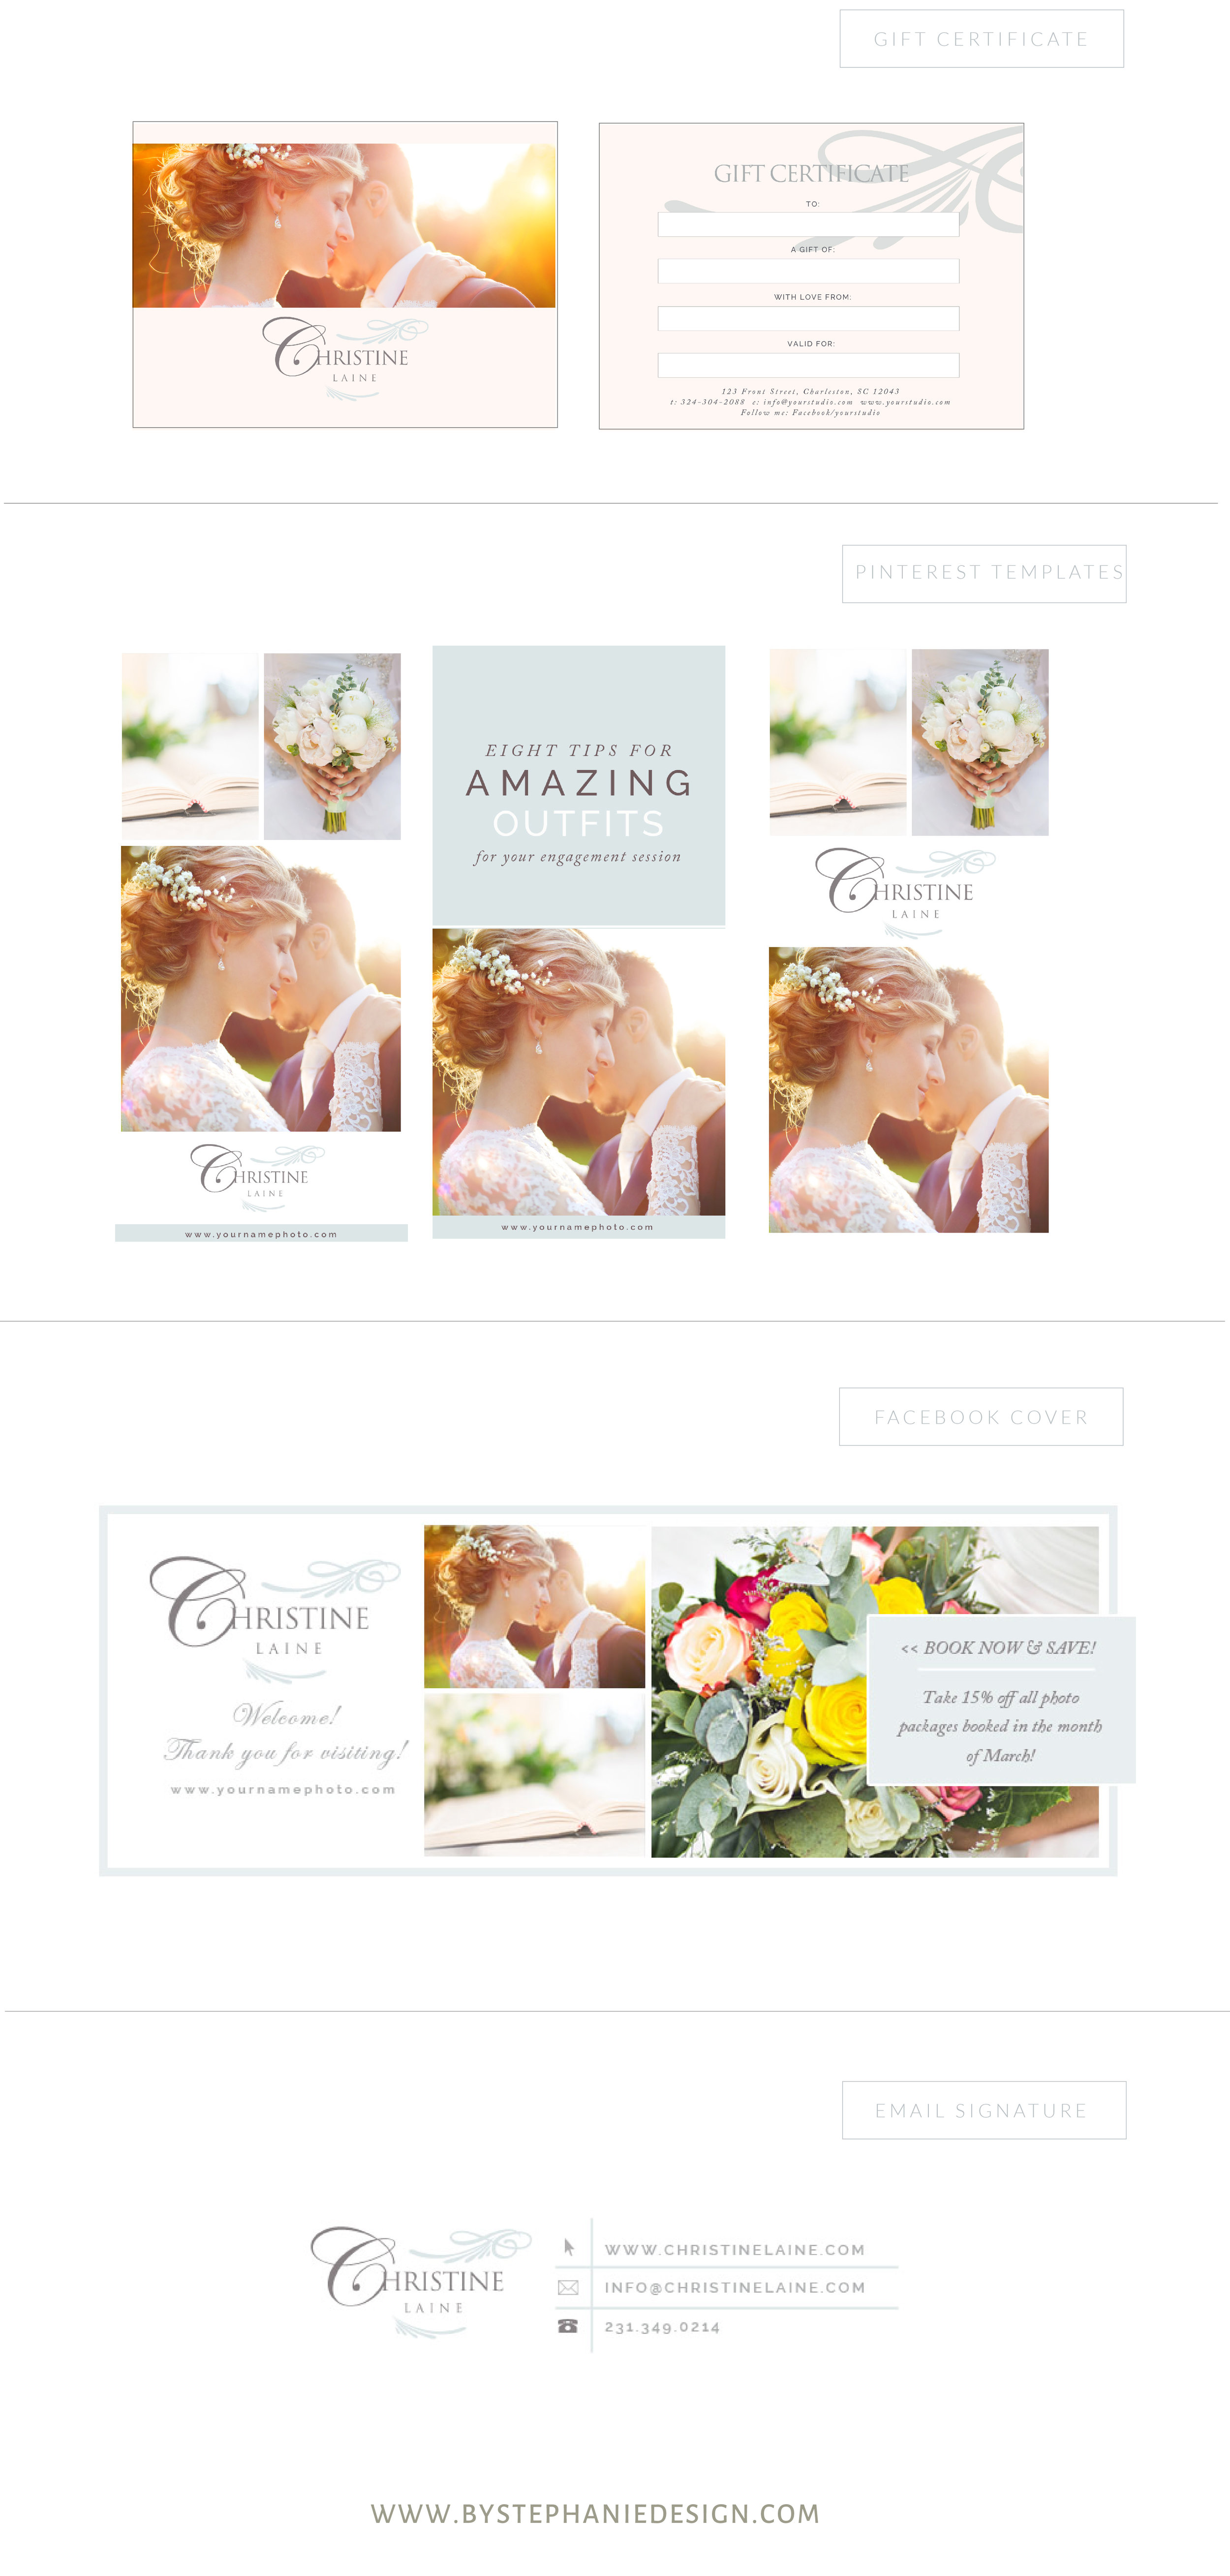 custom brand design for wedding photographers - by stephanie design